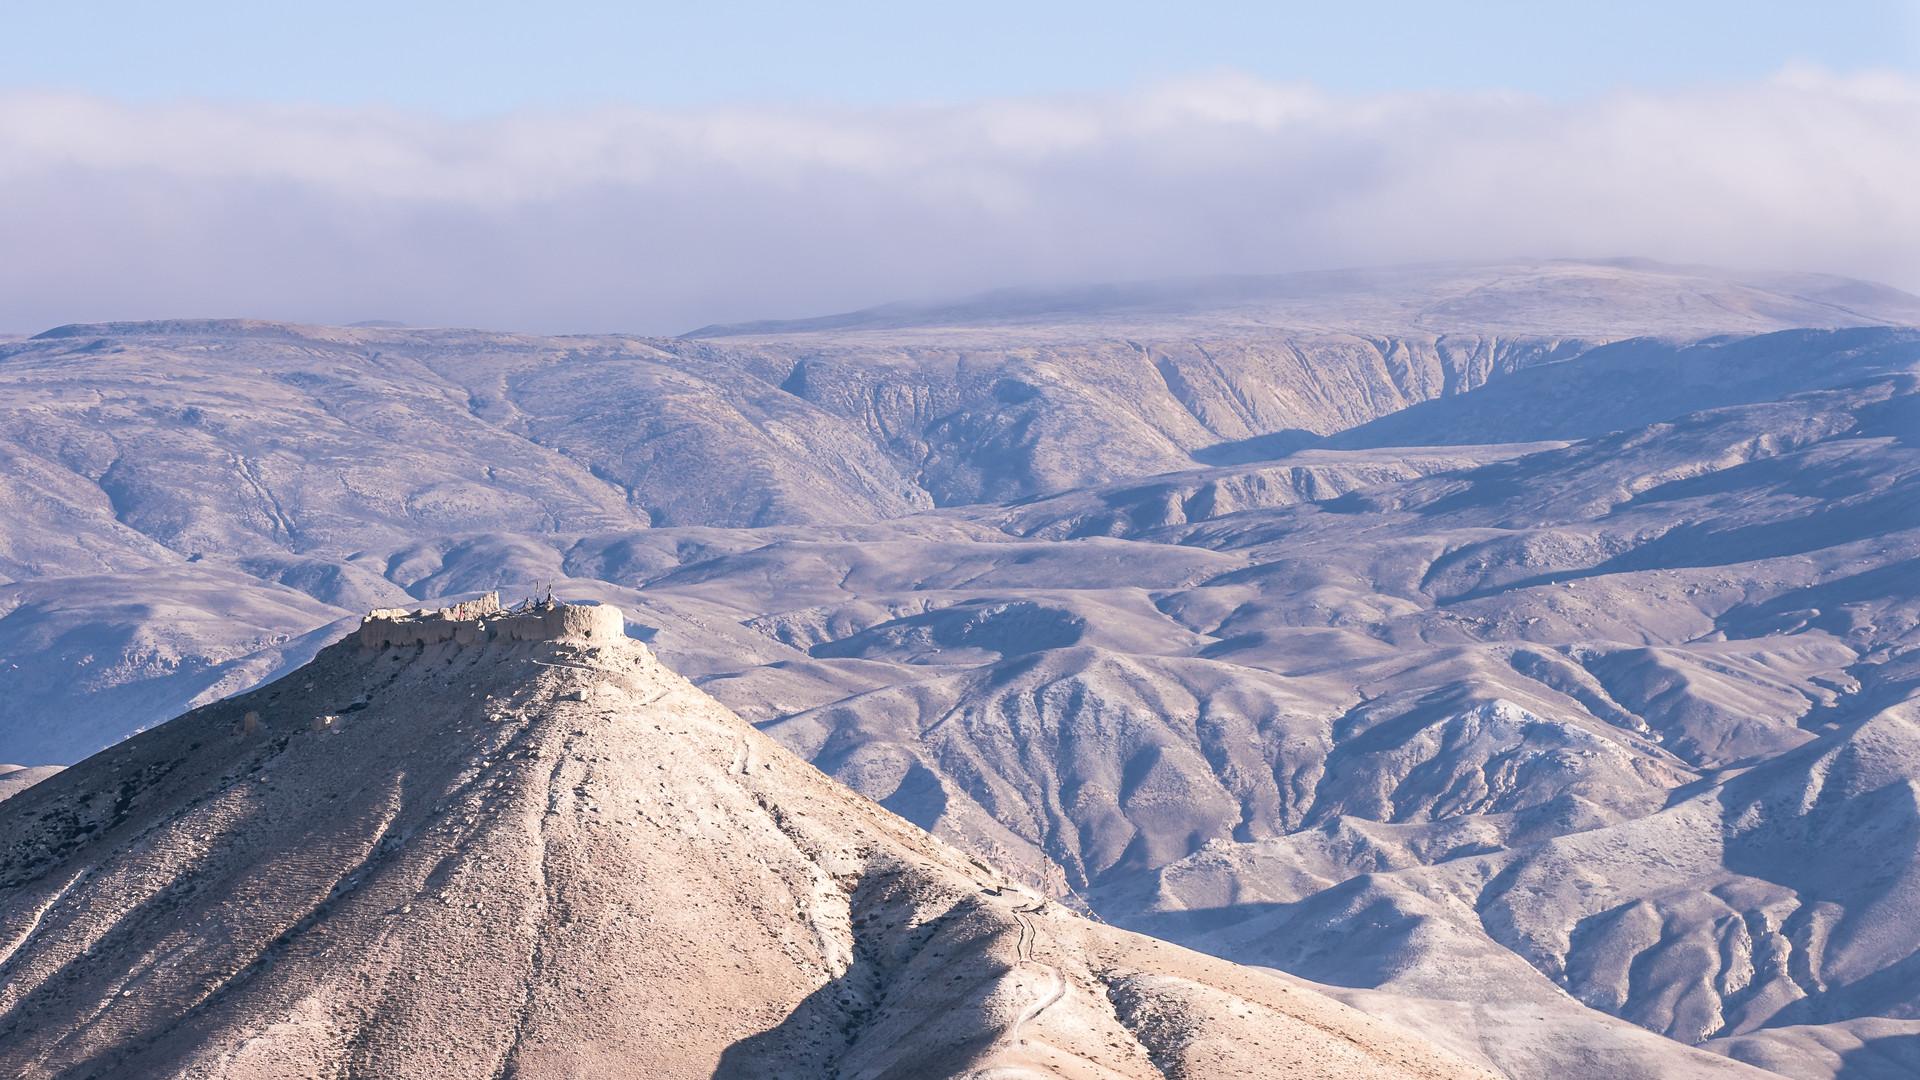 Upper Mustang Heights